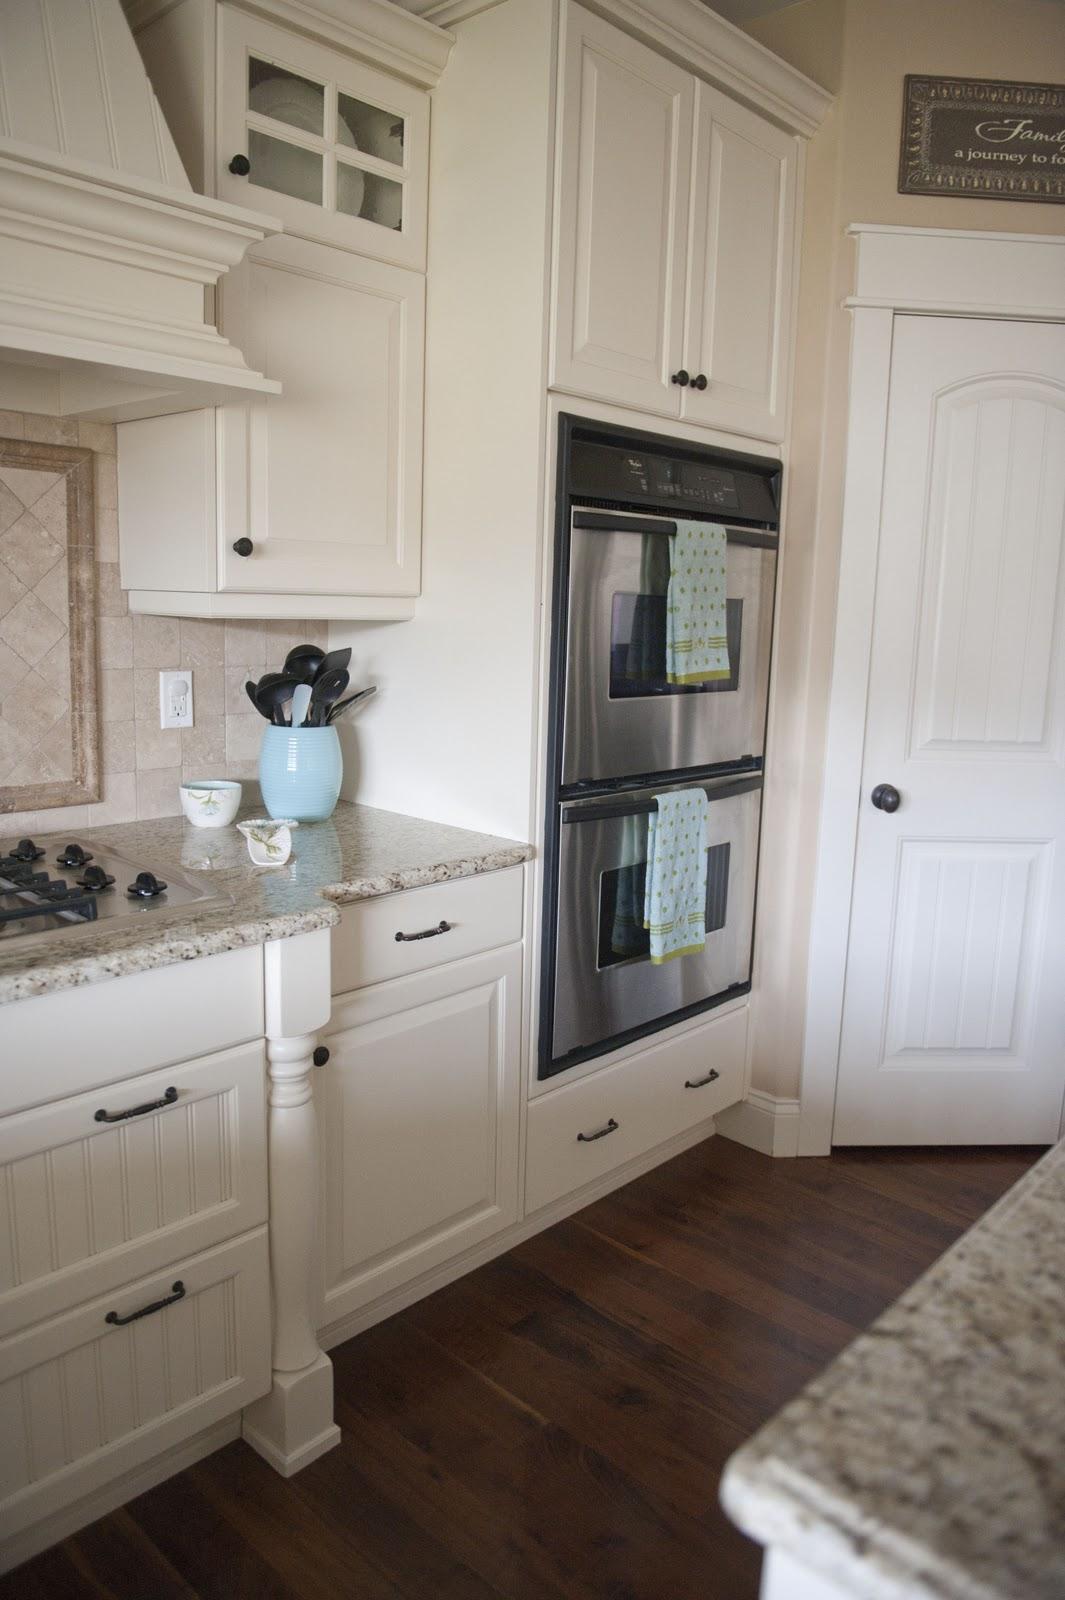 sita montgomery interiors my home tour kitchen. Black Bedroom Furniture Sets. Home Design Ideas